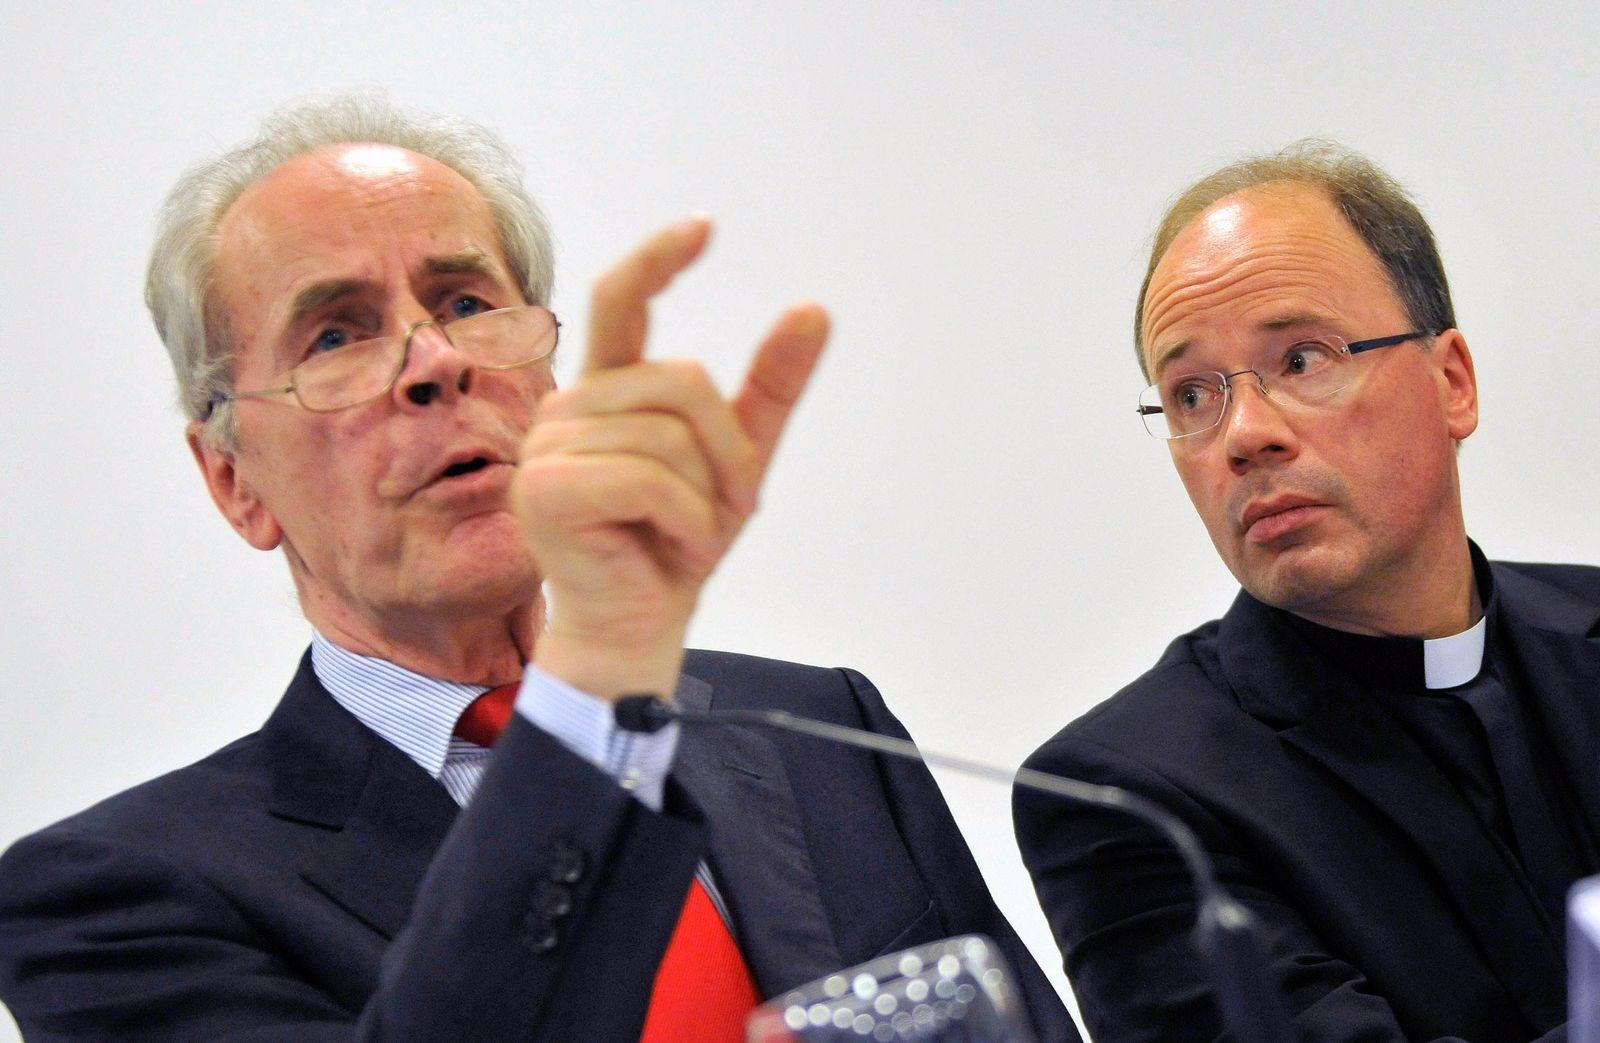 Bischofskonferenz/ Missbrauch/ Aufarbeitung/ Christian Pfeiffer/ Stephan Ackermann